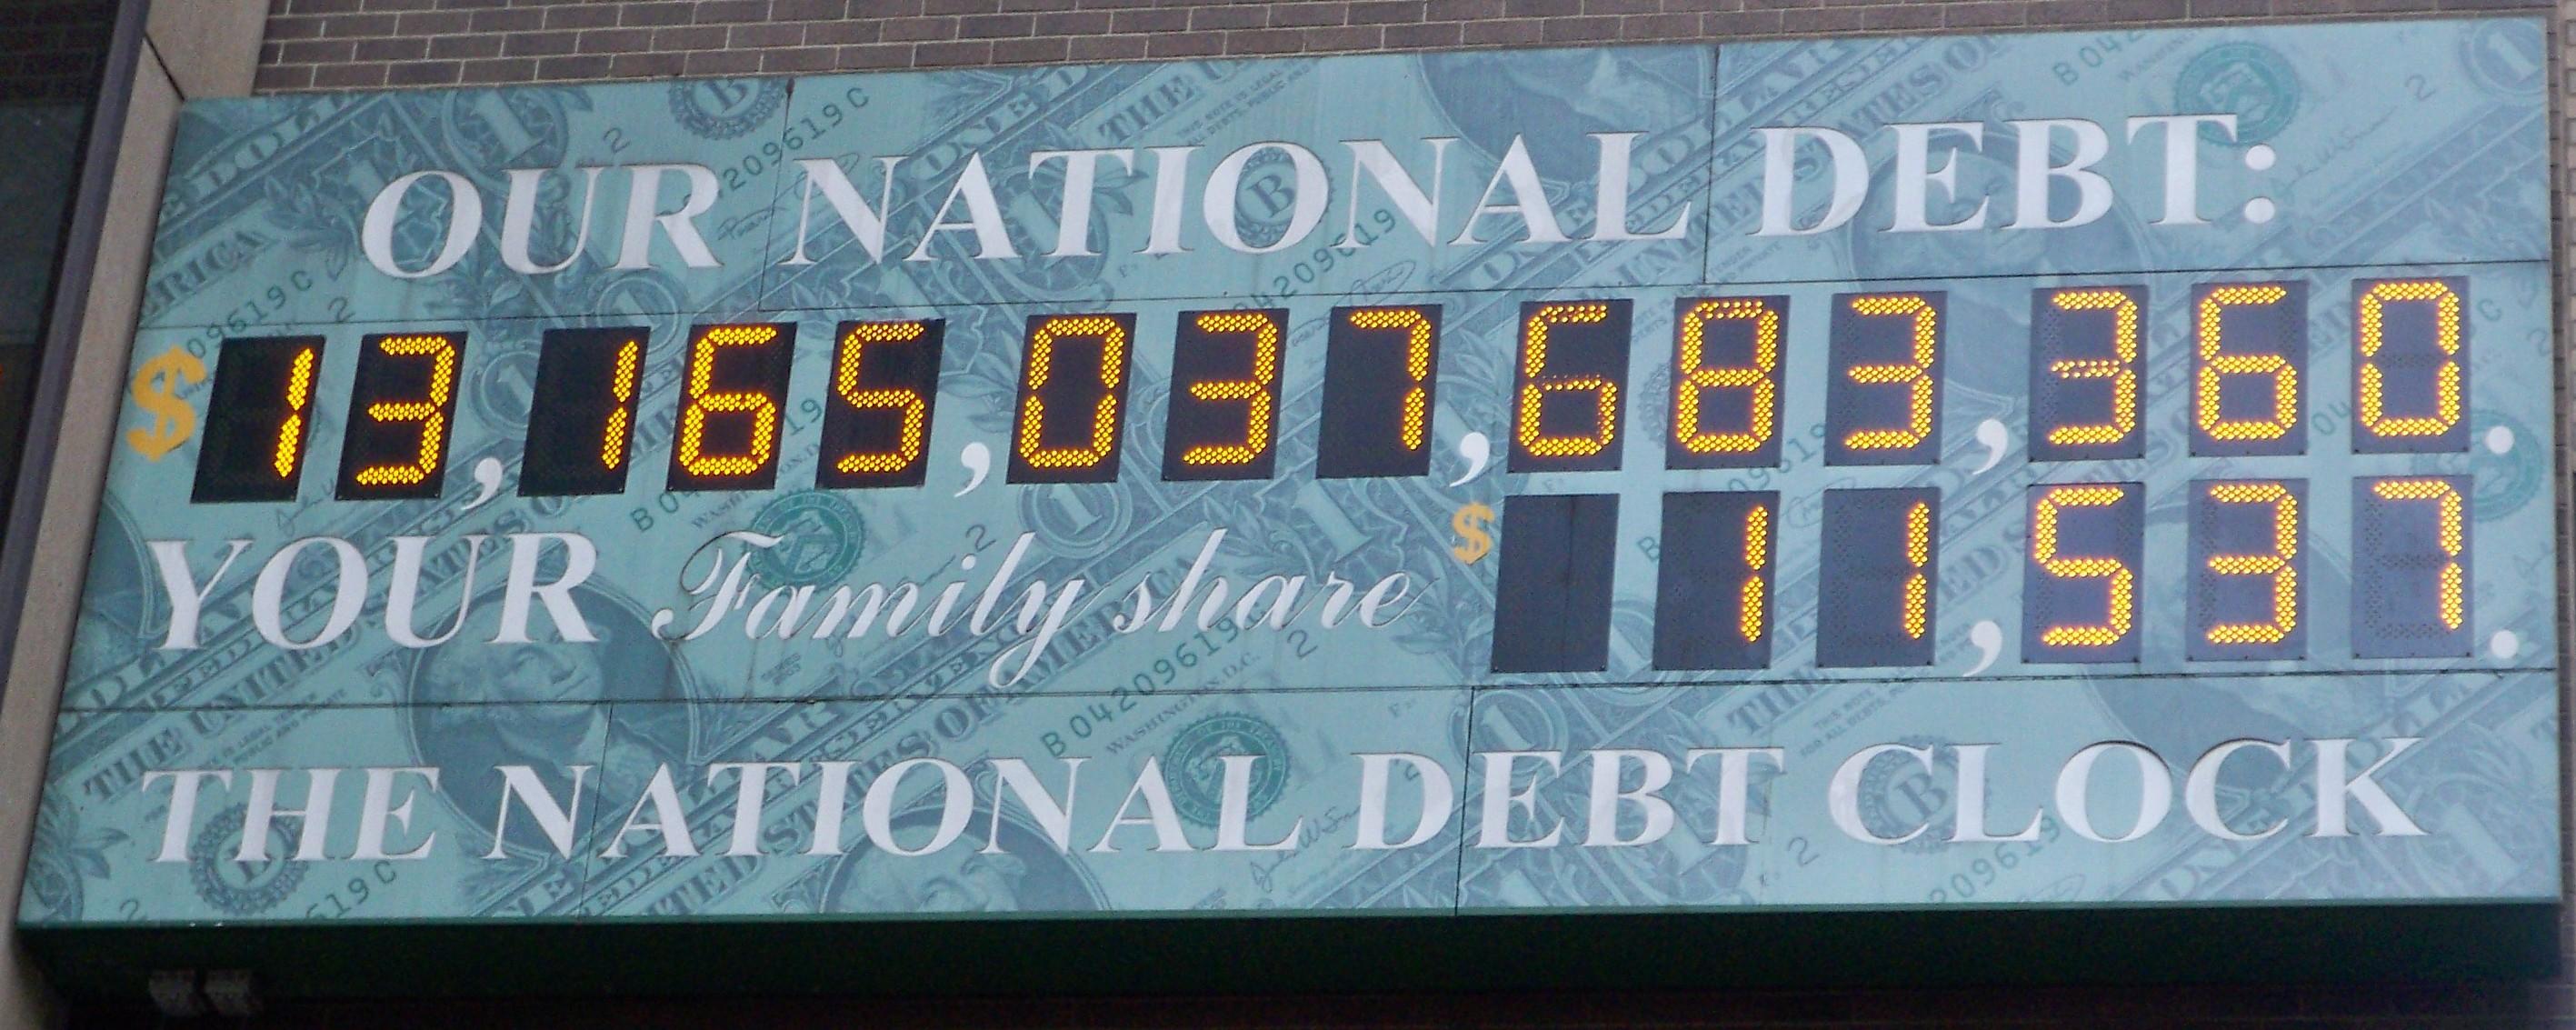 Us Debt Holders Chart: National Debt Clock by Matthew Bisanz.JPG - Wikimedia Commons,Chart